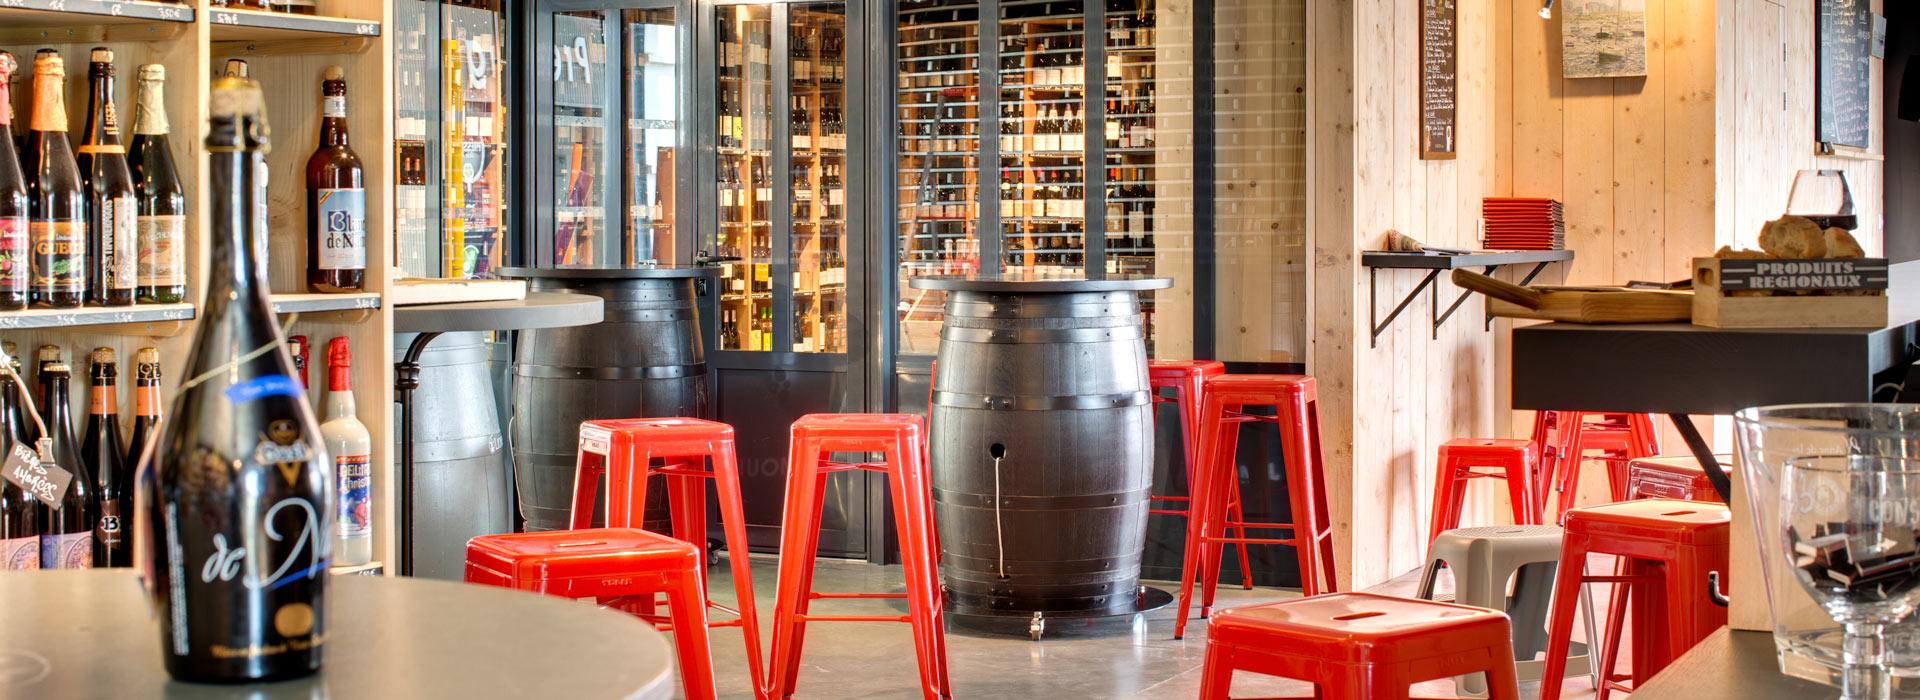 photographe-restaurants-loire-atlantique-nantes-la-baule